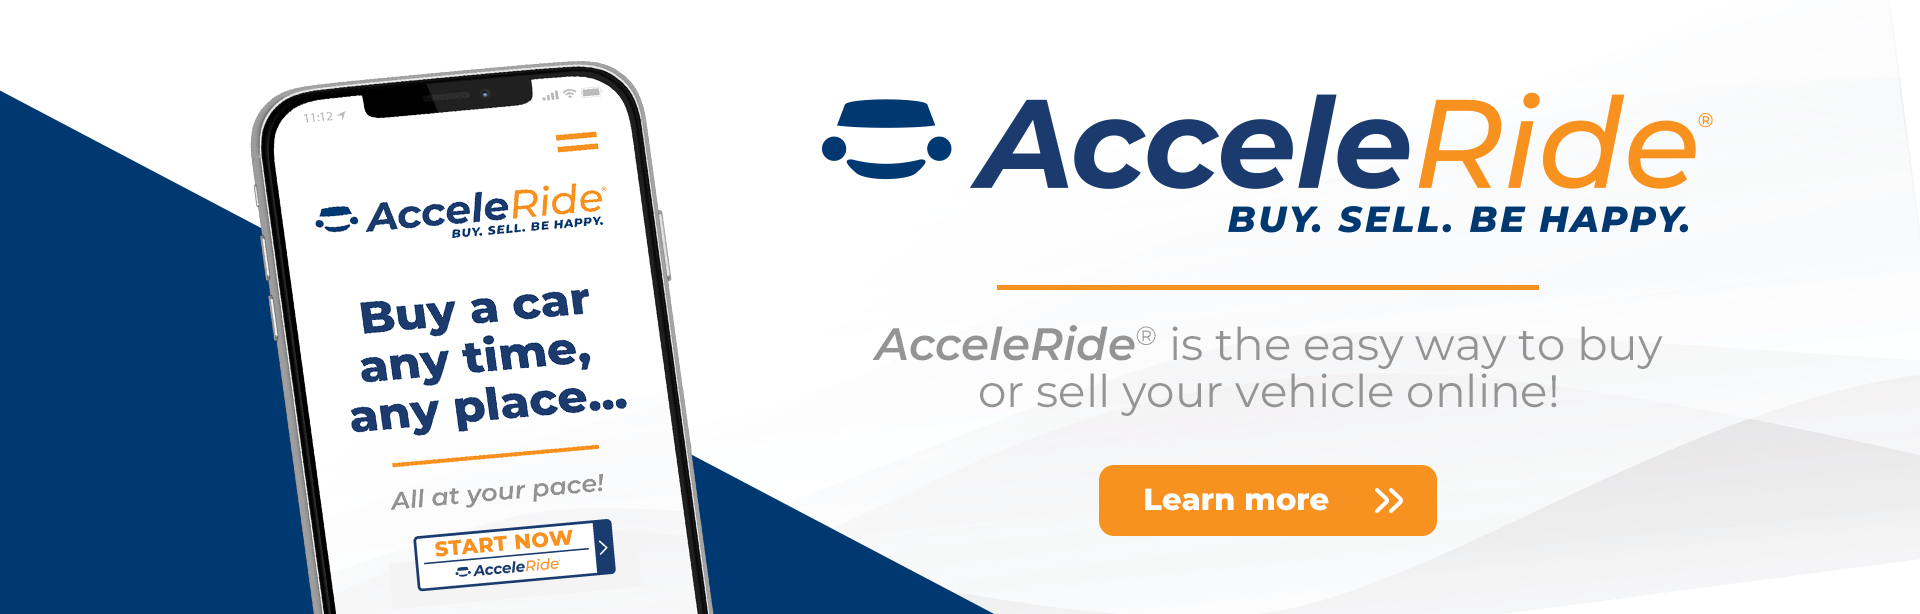 AcceleRide Header